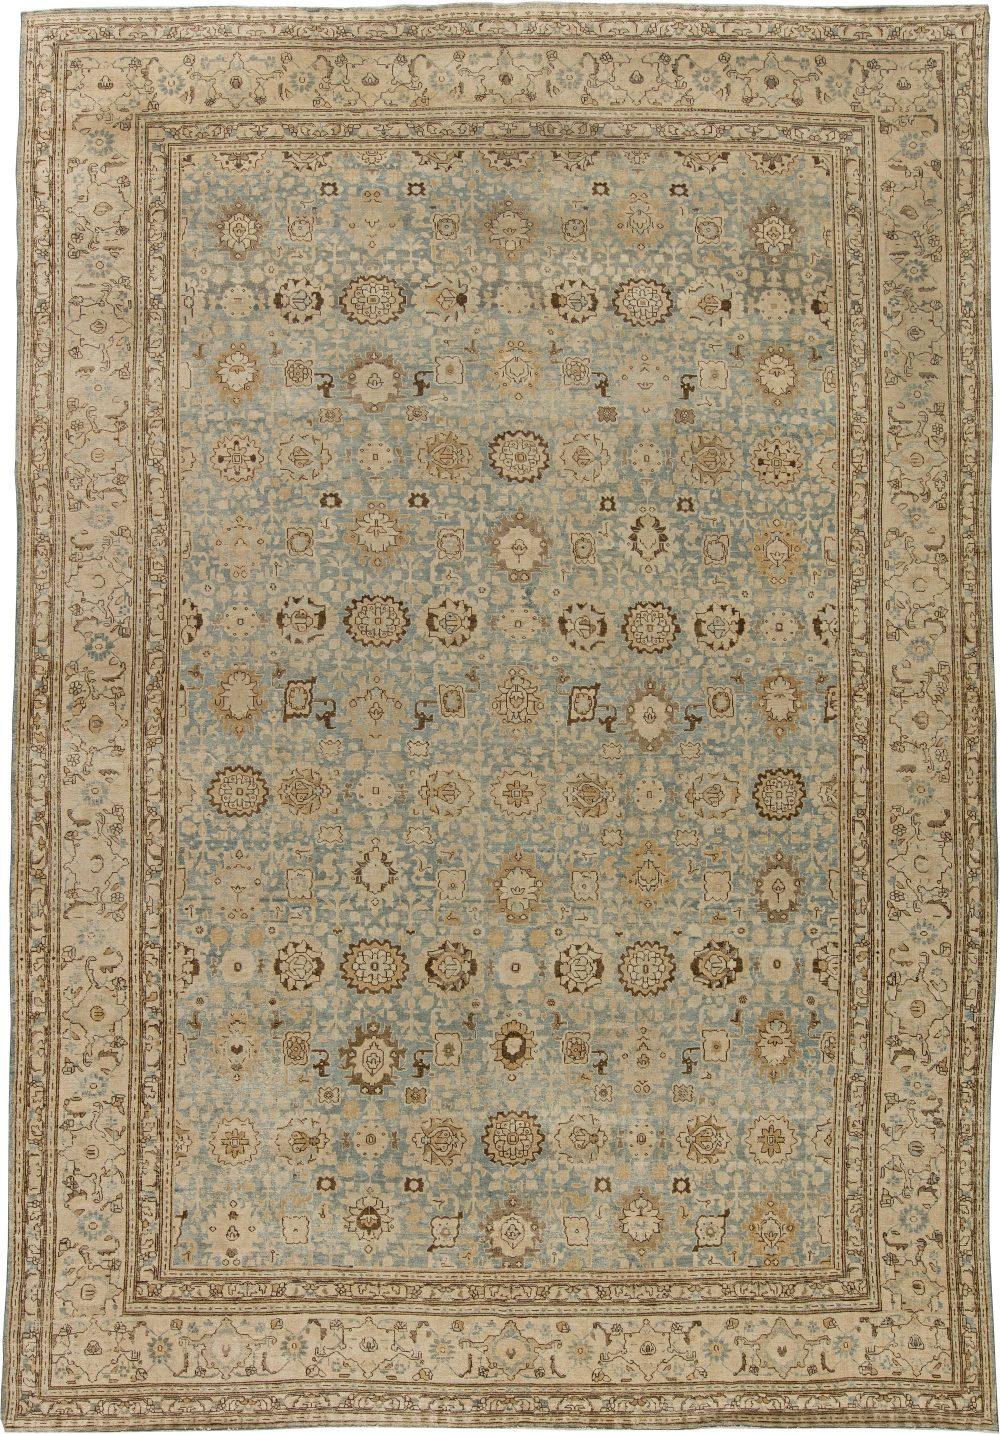 Antique Persian Tabriz Rug BB6276